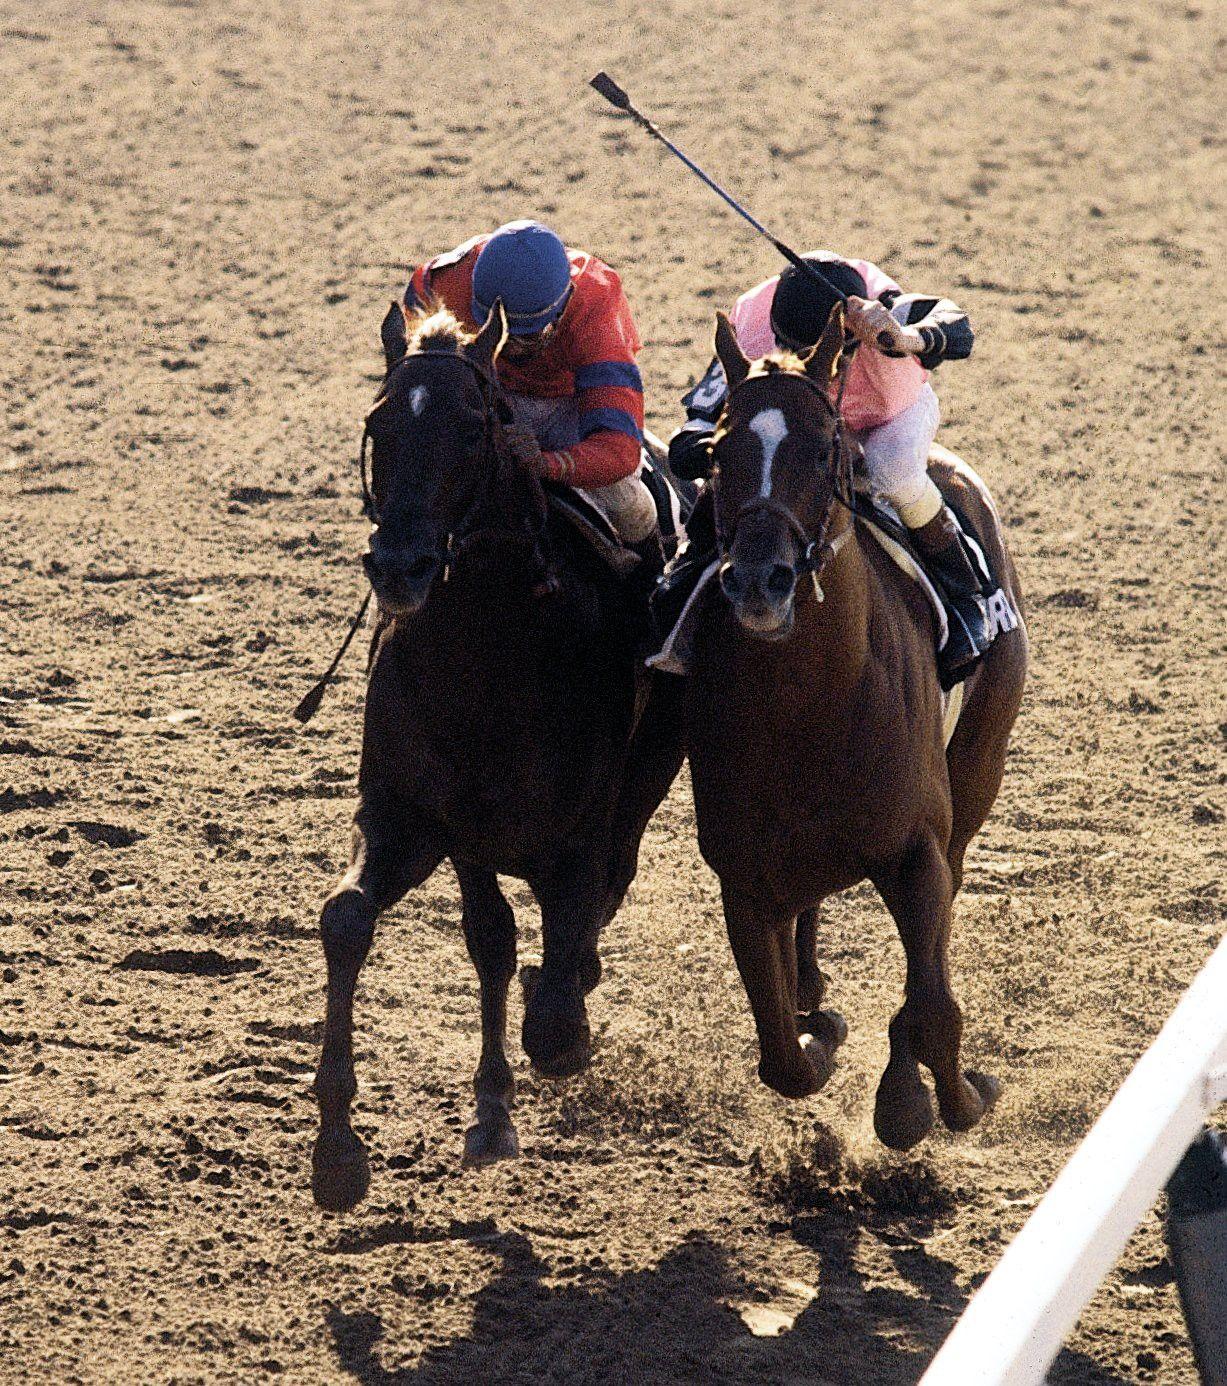 bfb4245a7be Affirmed Alydar ♡♡ Horse Racing